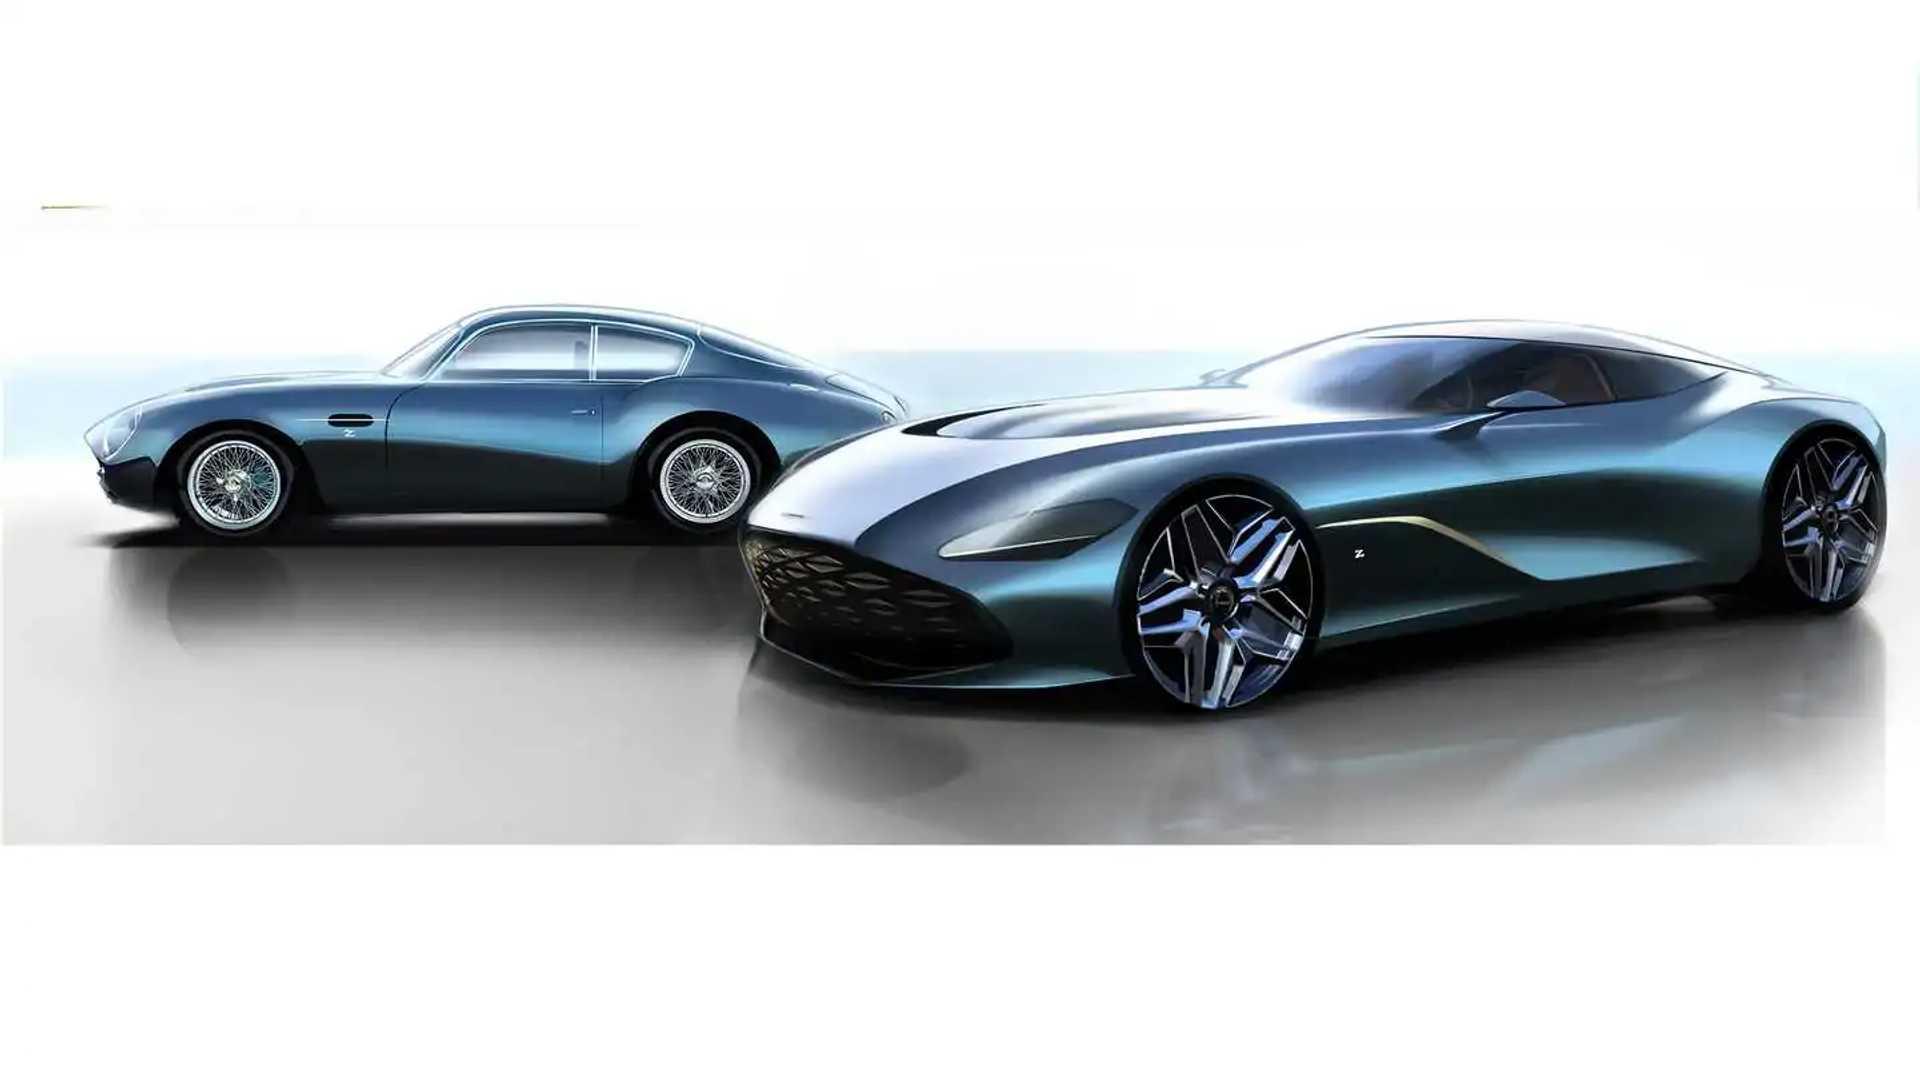 Aston Martin Dbs Gt Zagato Looks Stunning In New Sketches